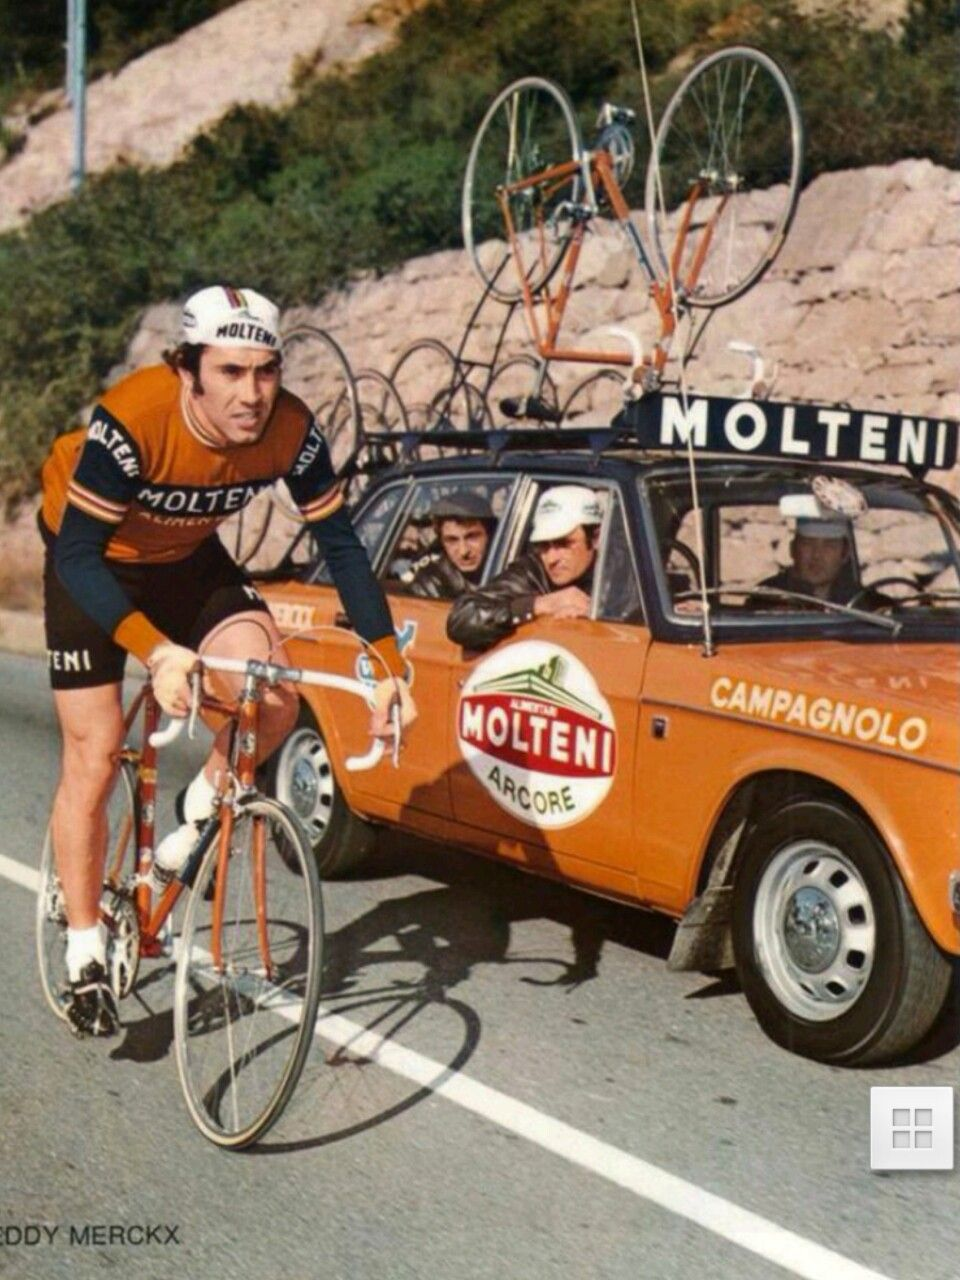 Molteni, E.Merckx | Fotos ciclismo, Ciclismo, Bicicletas retro